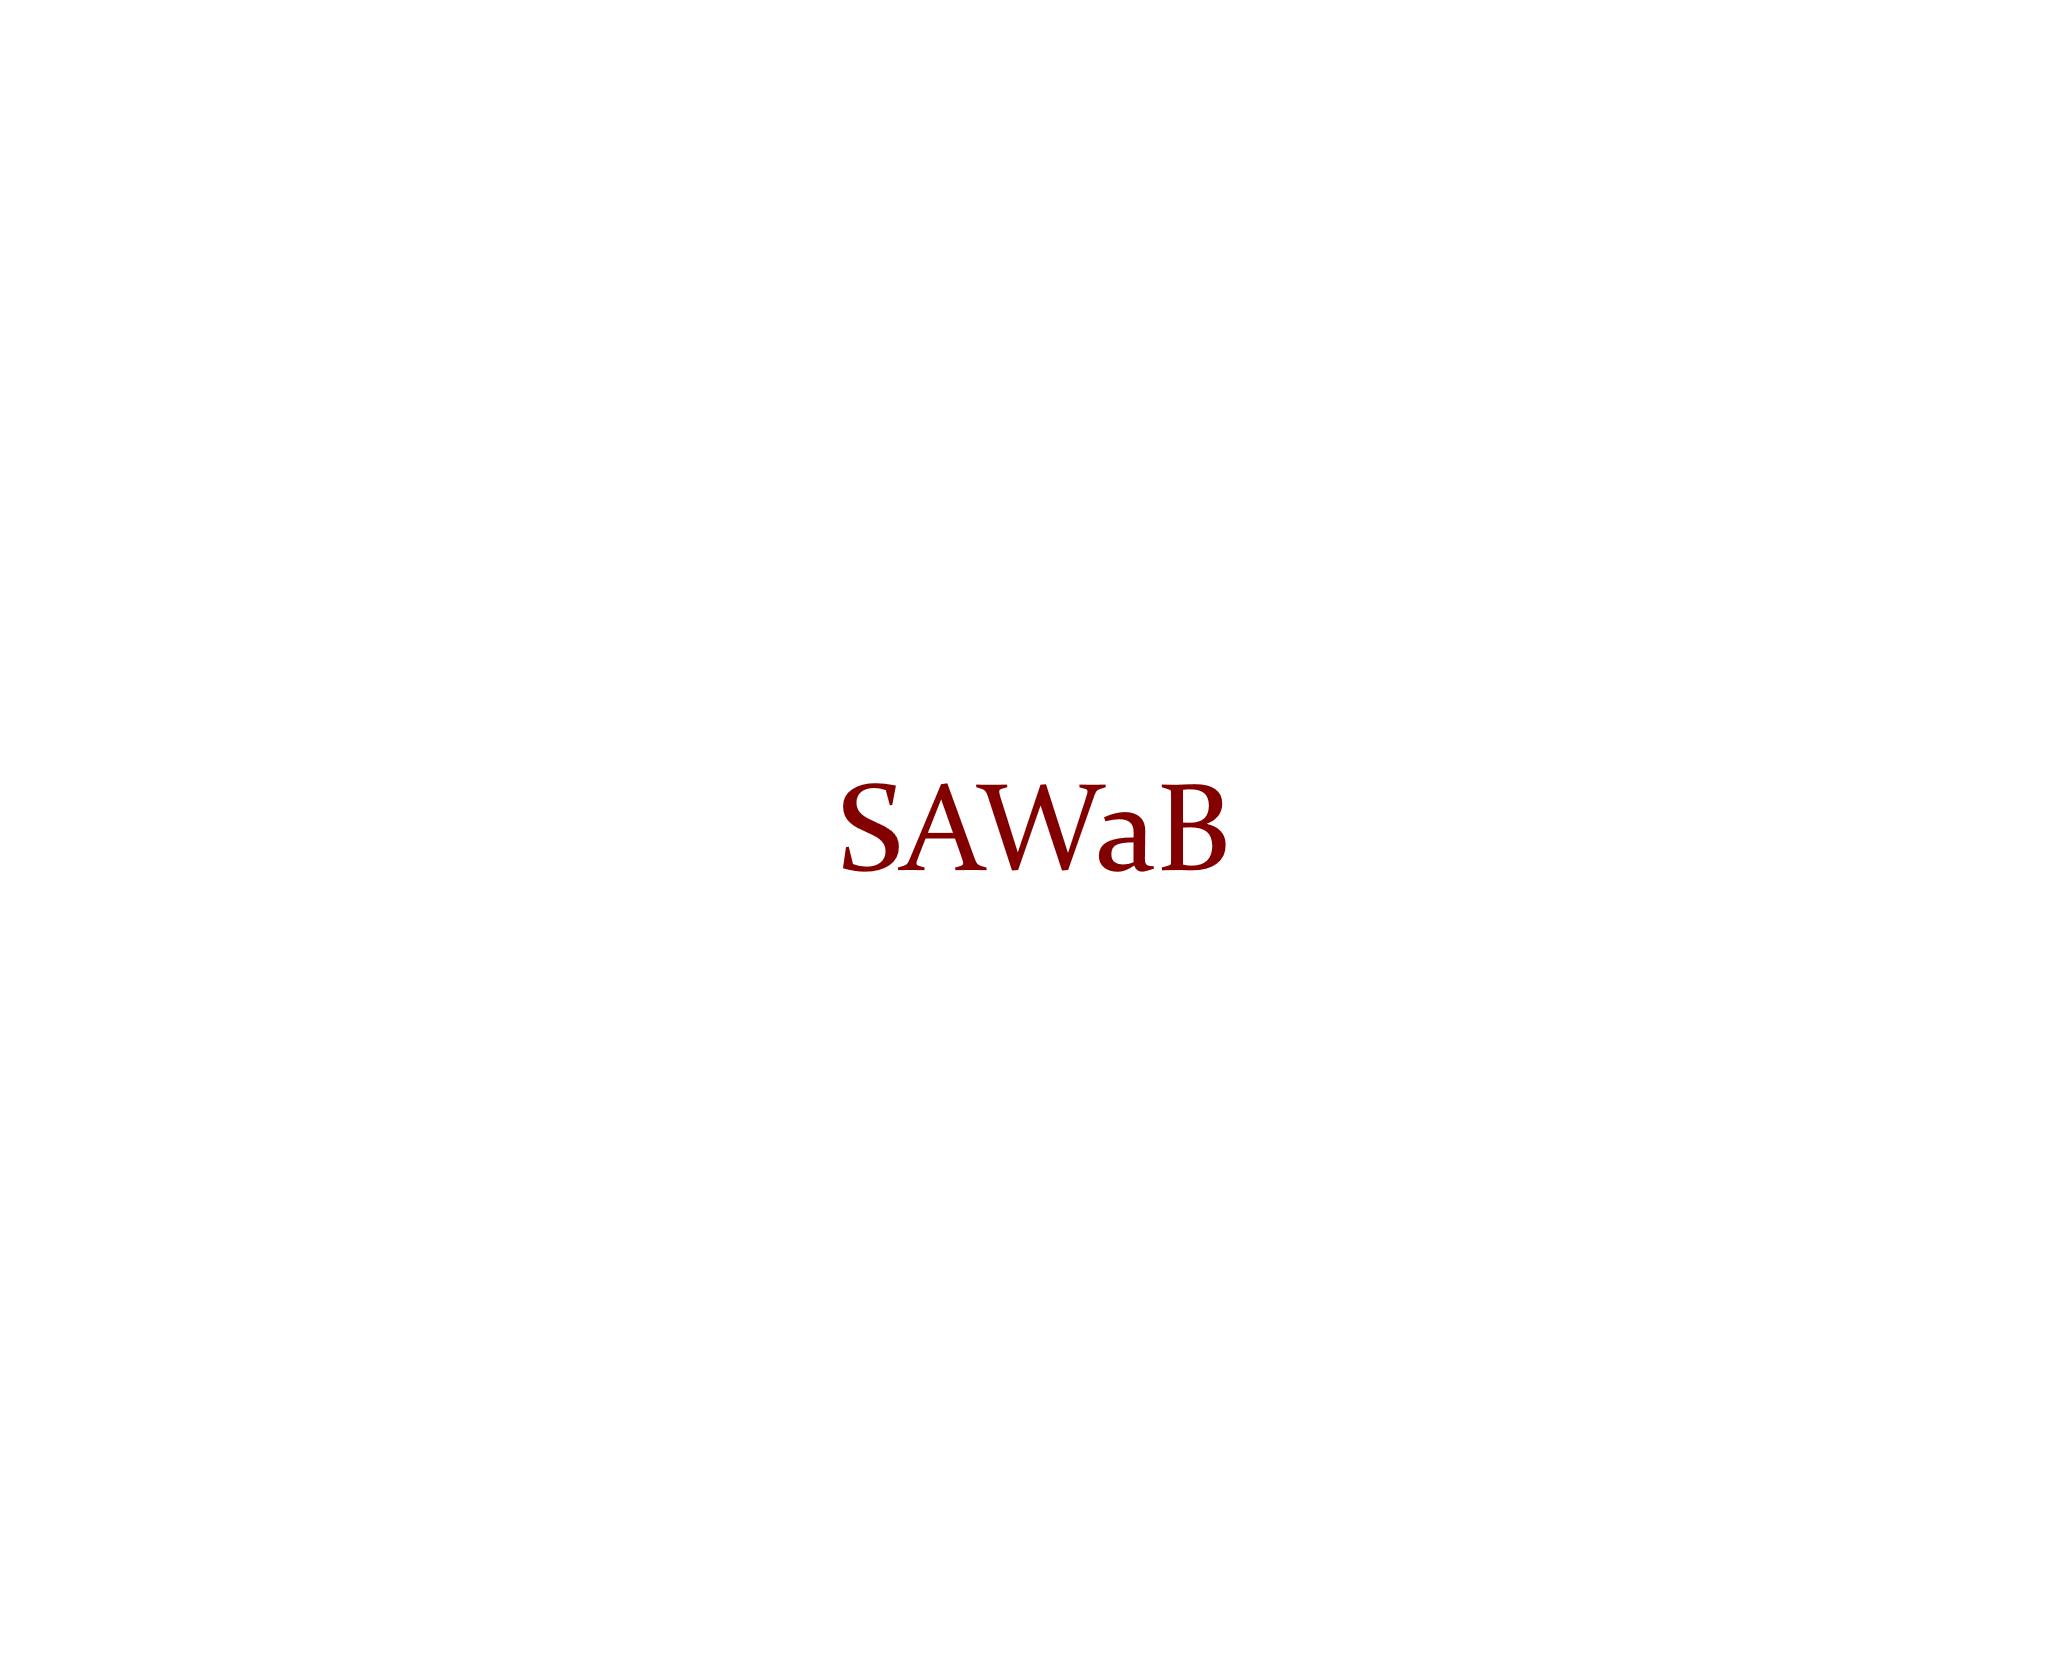 SaWaB